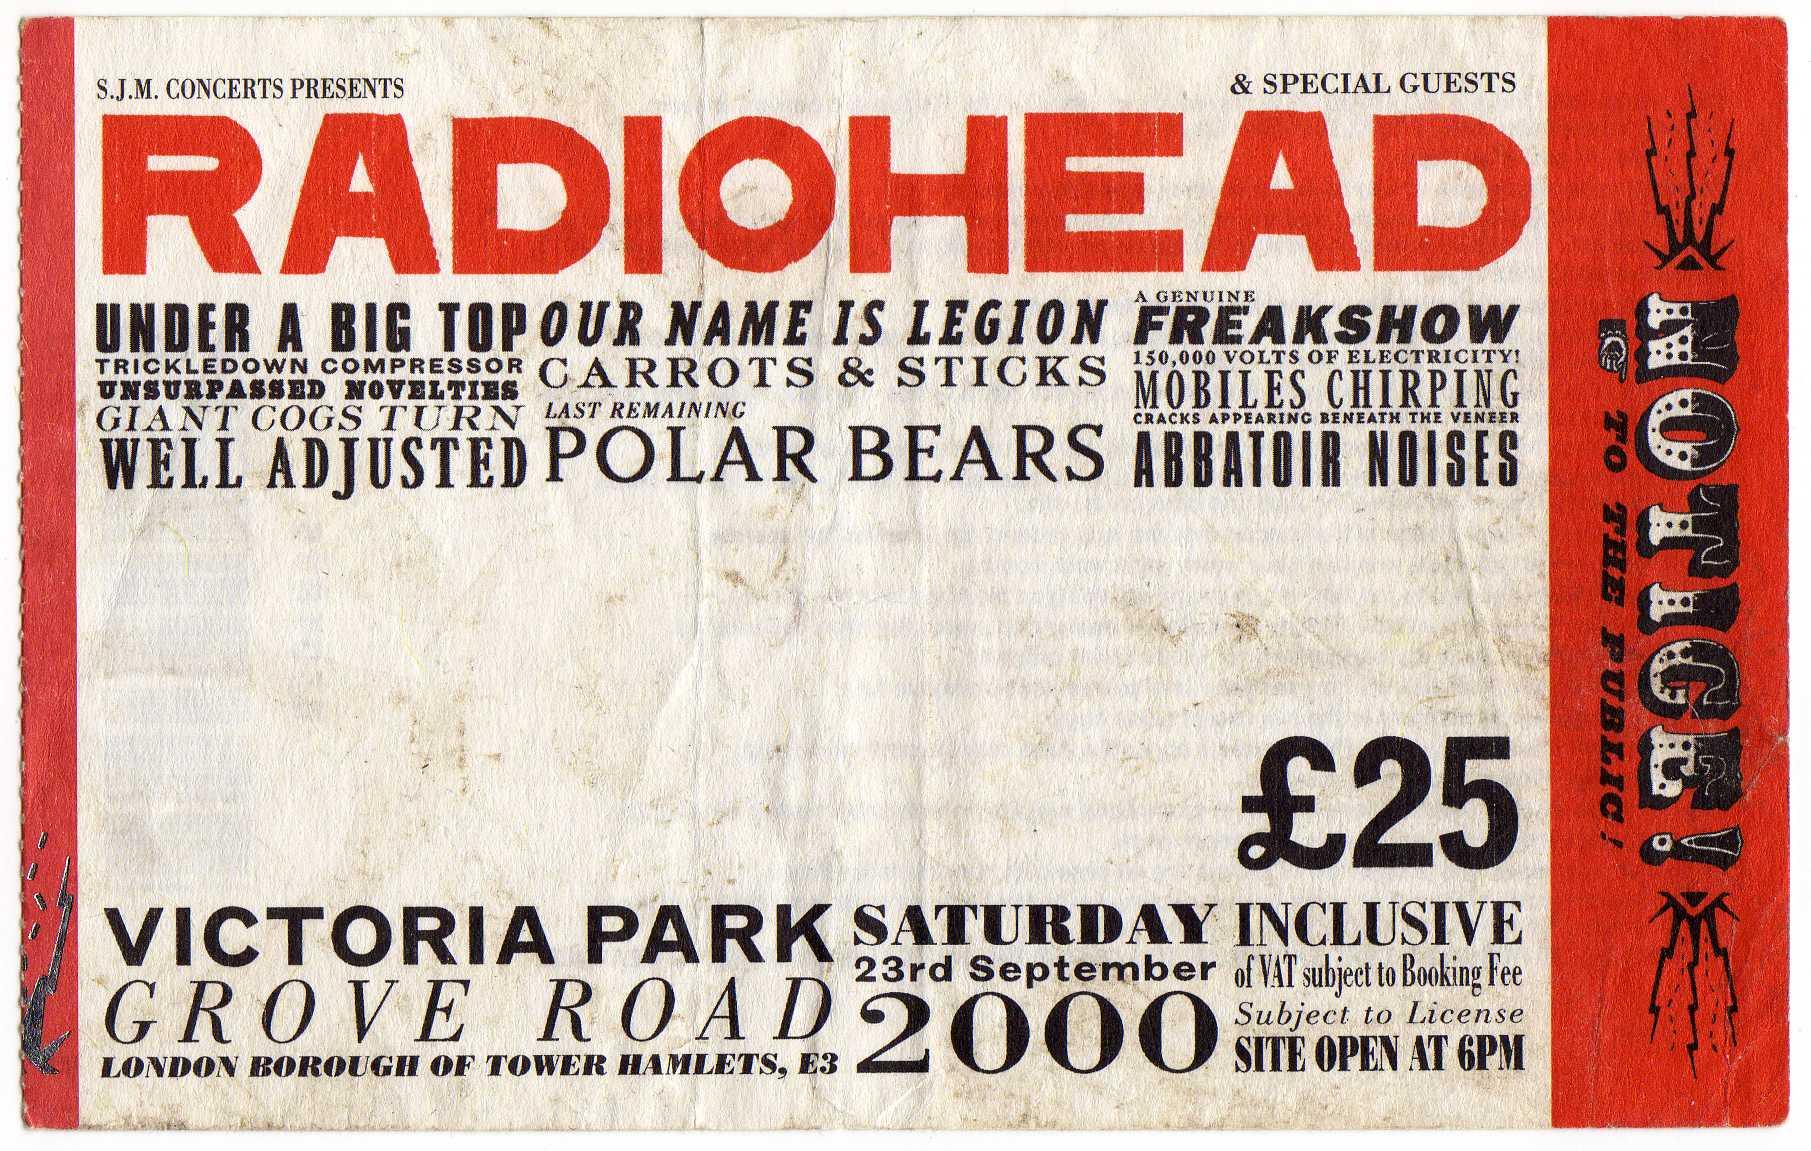 radiohead-23-9-2000001-1